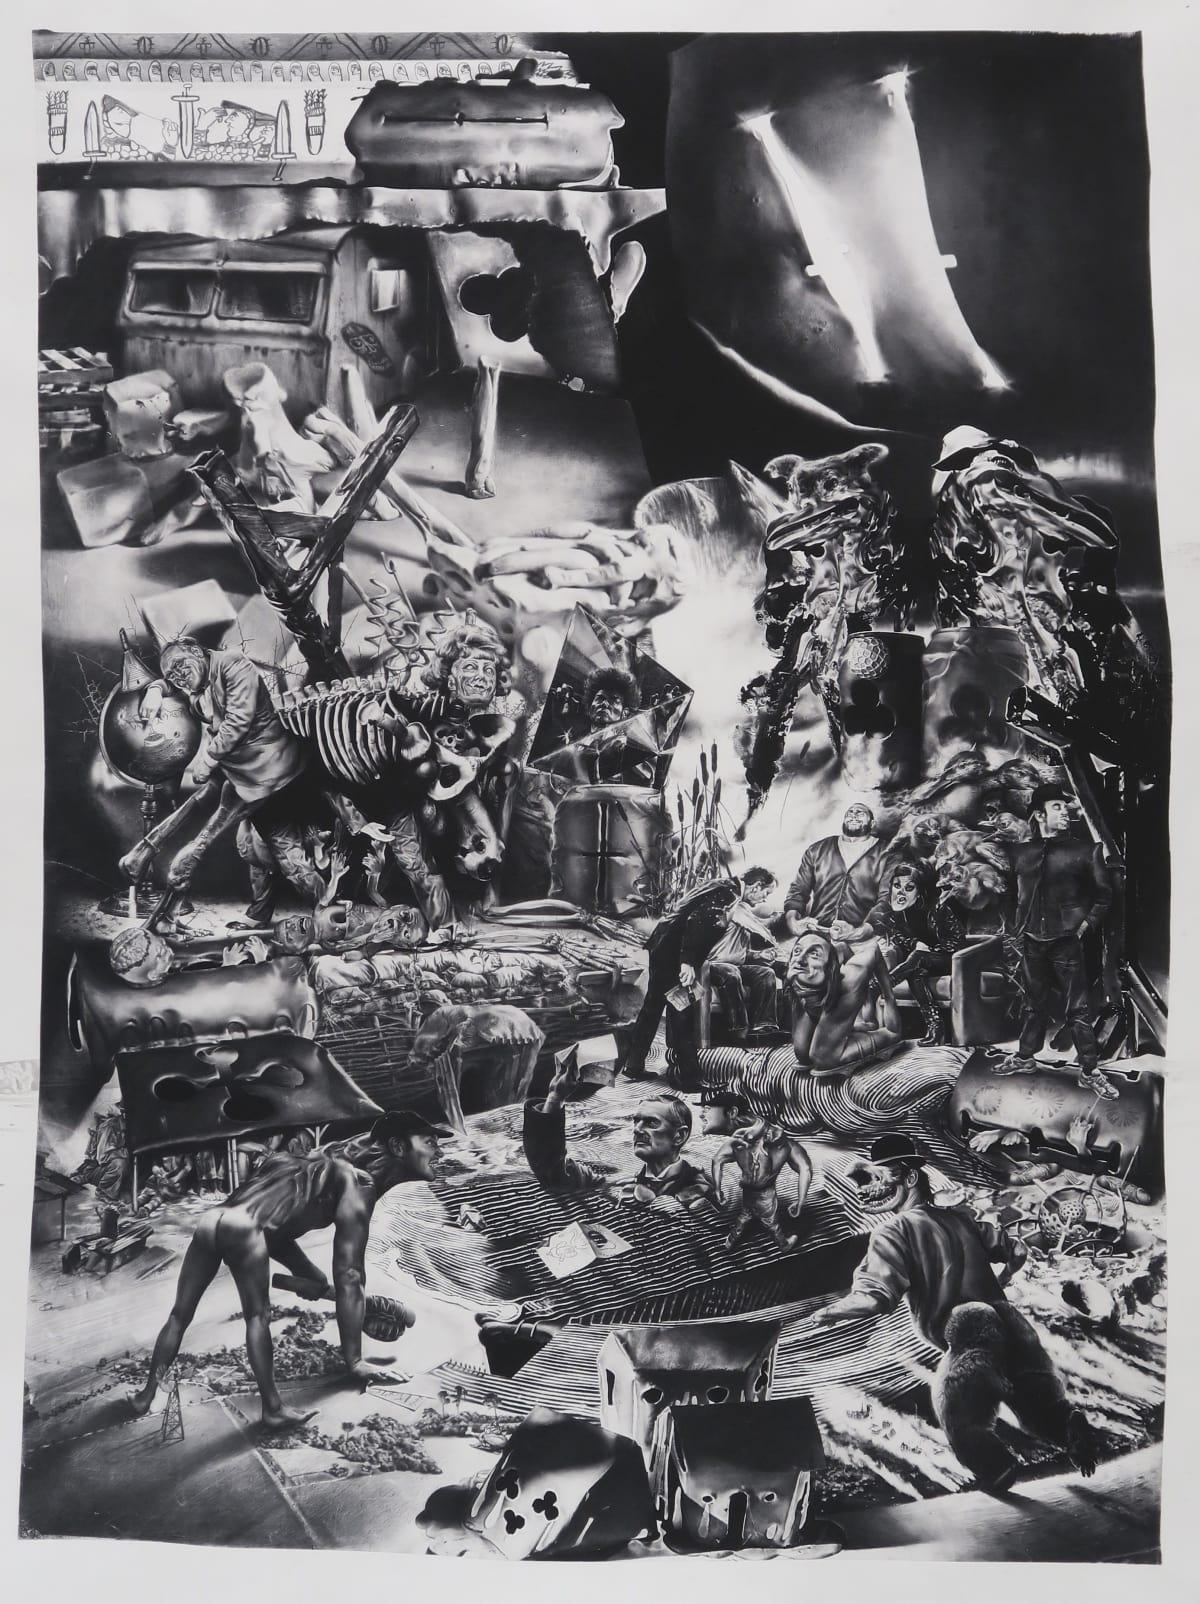 Robert McNally  Ânnus Horribilis, 2016  90.4 x 68.4 x 20 cm  35 5/8 x 26 7/8 x 7 7/8 in  Framed within a lightbox